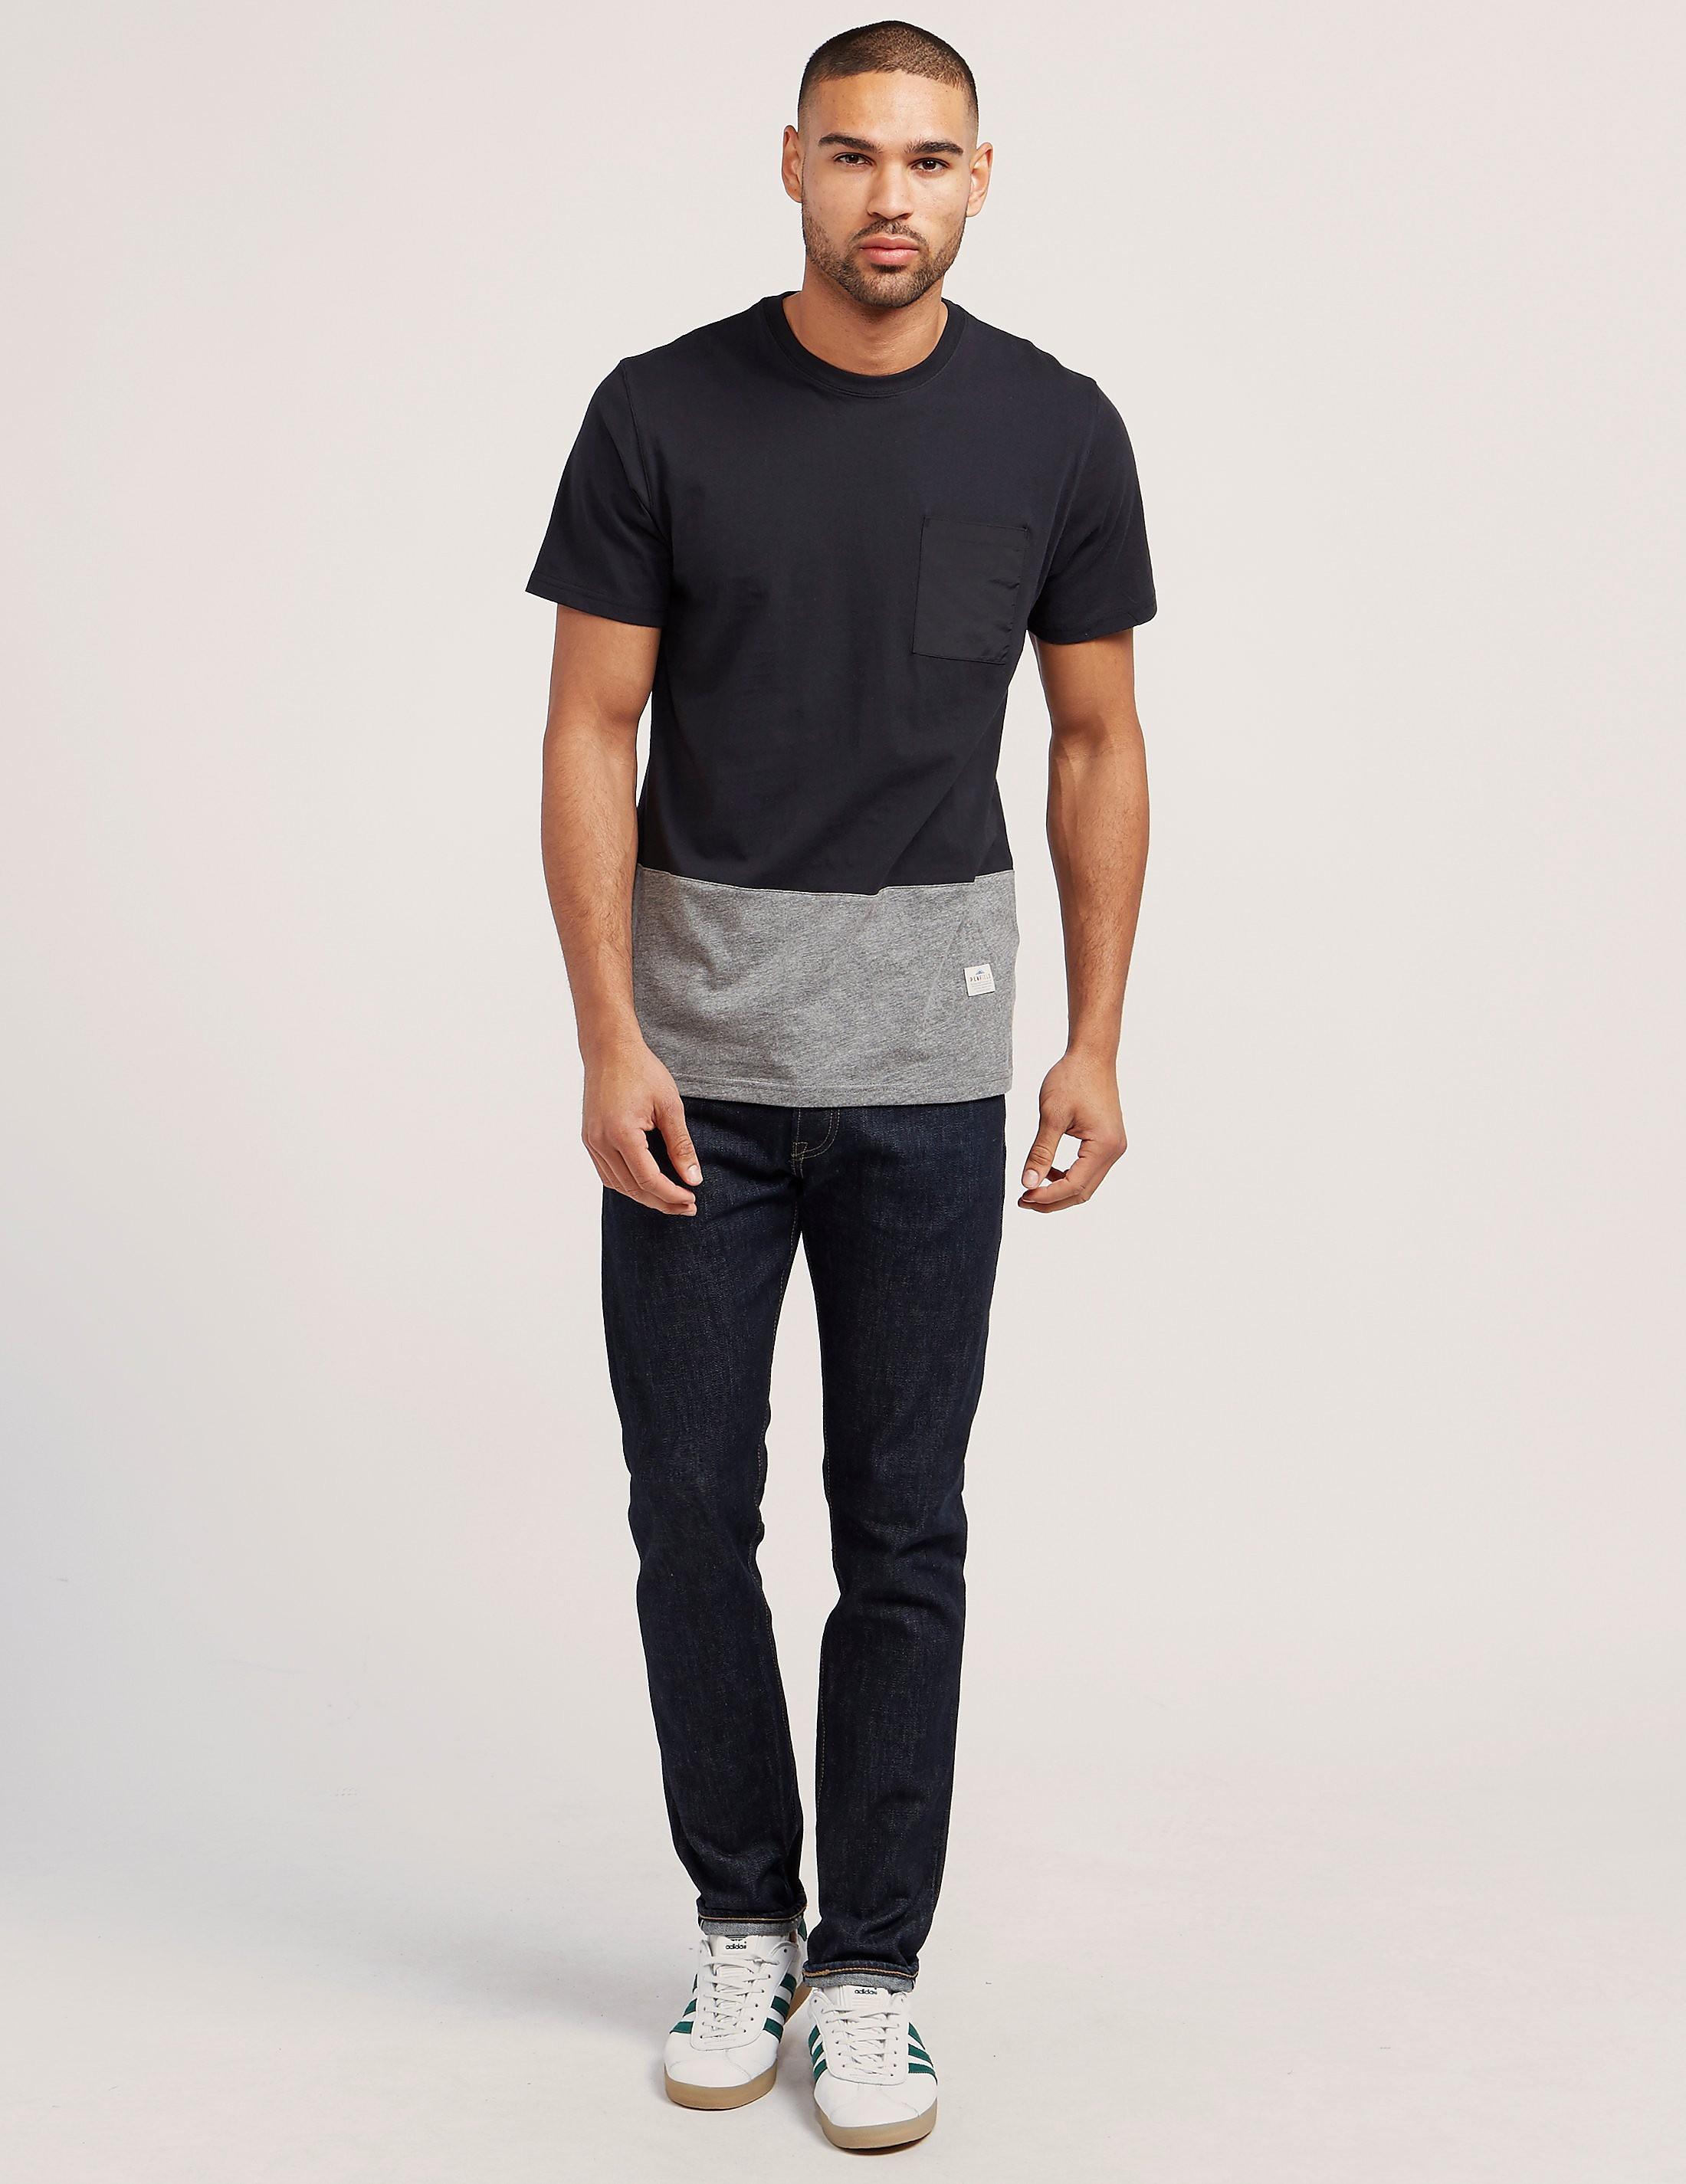 Penfield Sanders Block Short Sleeve T-Shirt